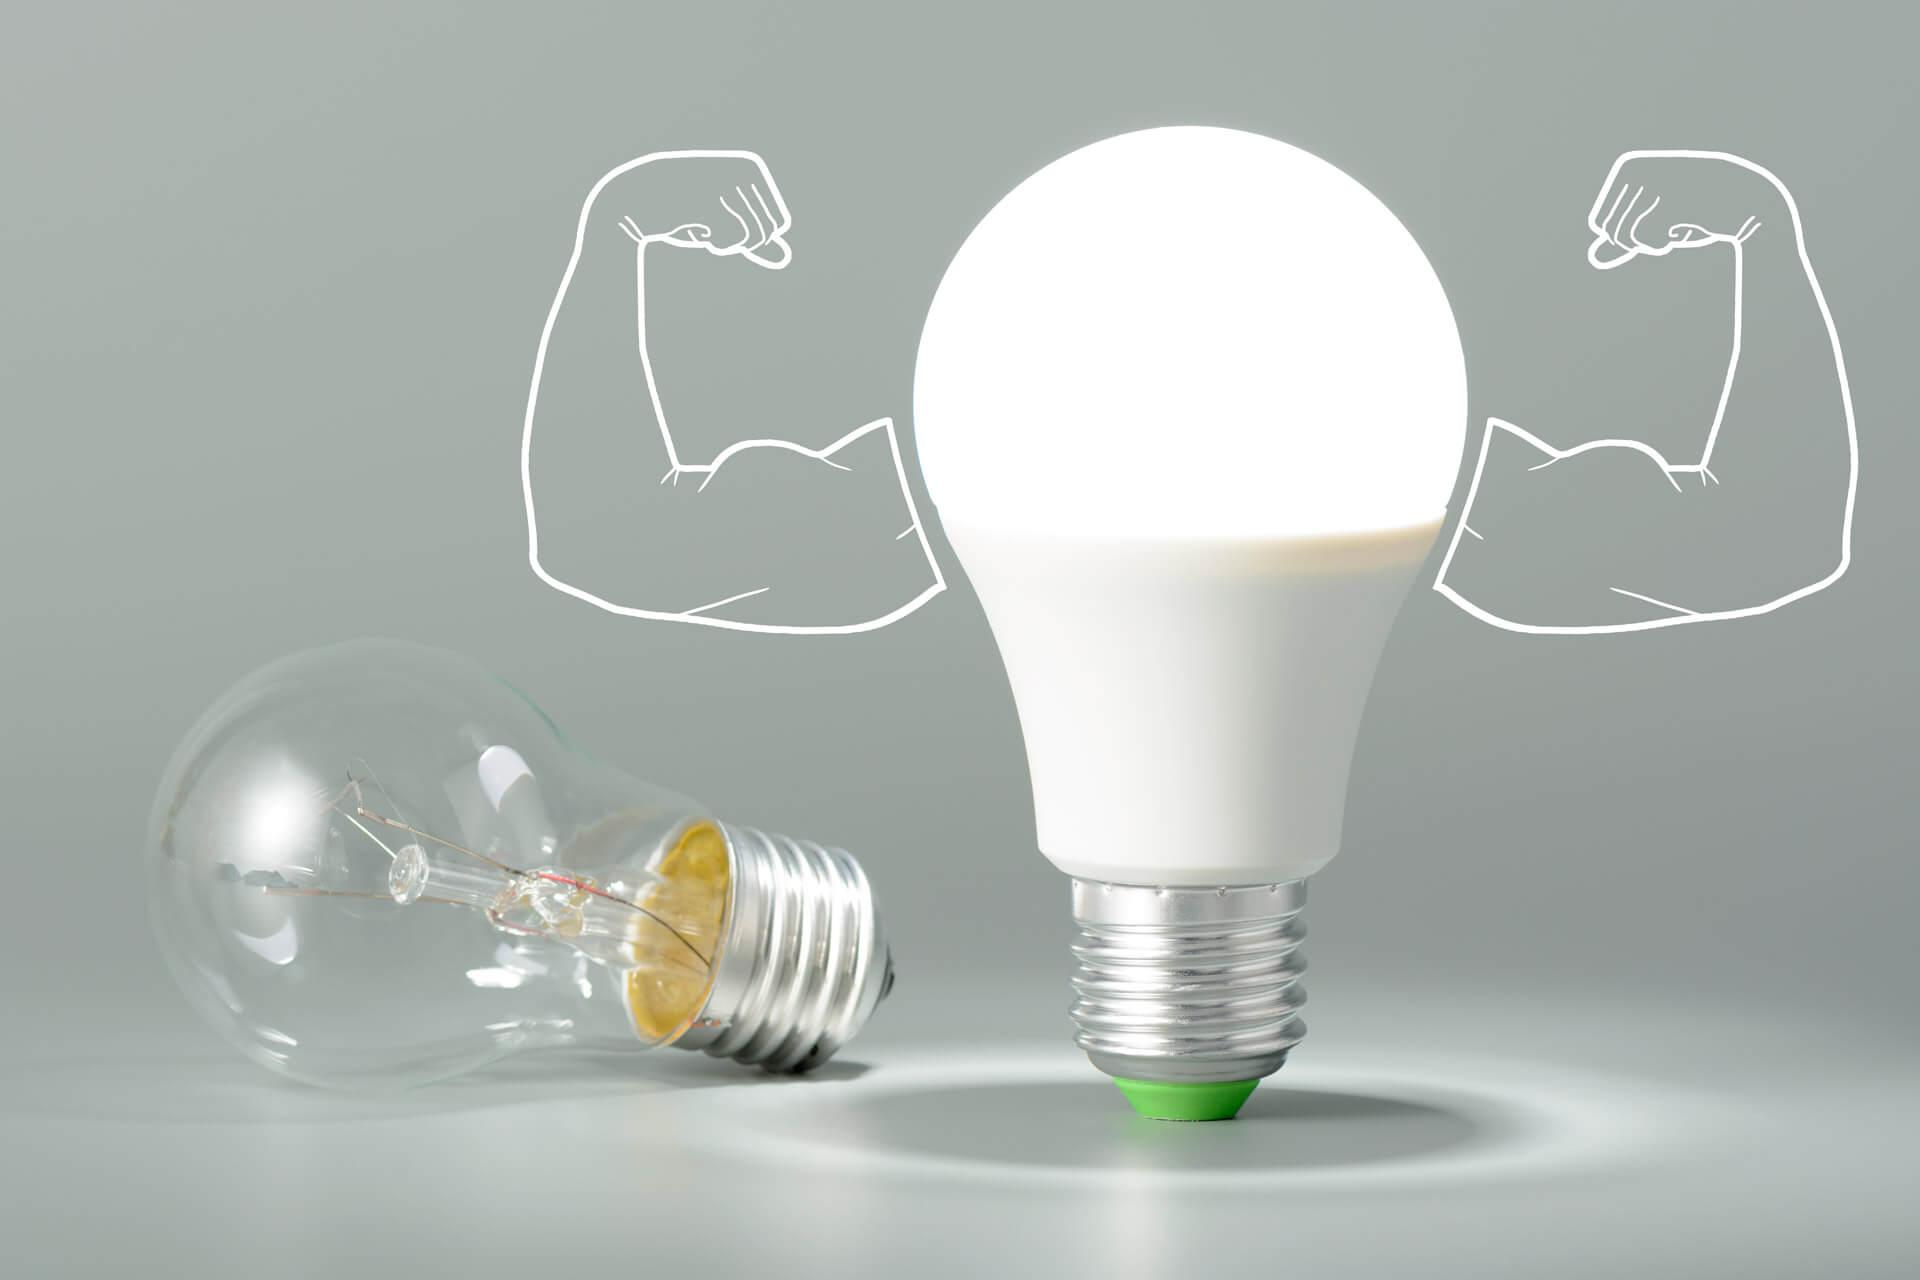 iluminacion-led-ahorro-energetico